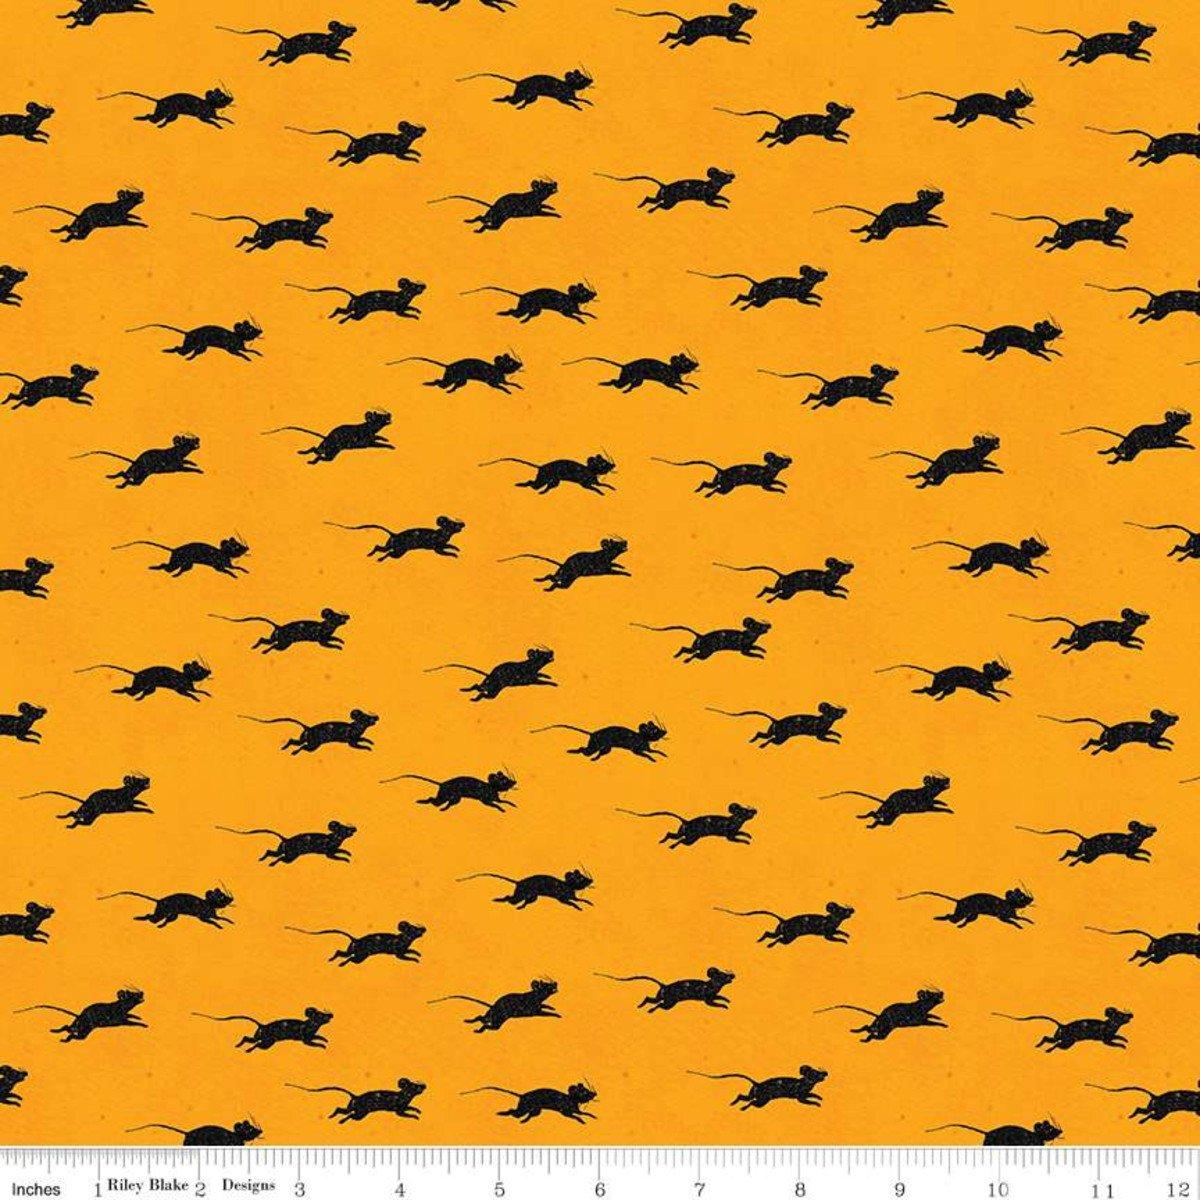 Orange - Blind Mice - Goose Tales - C9399-ORANGE